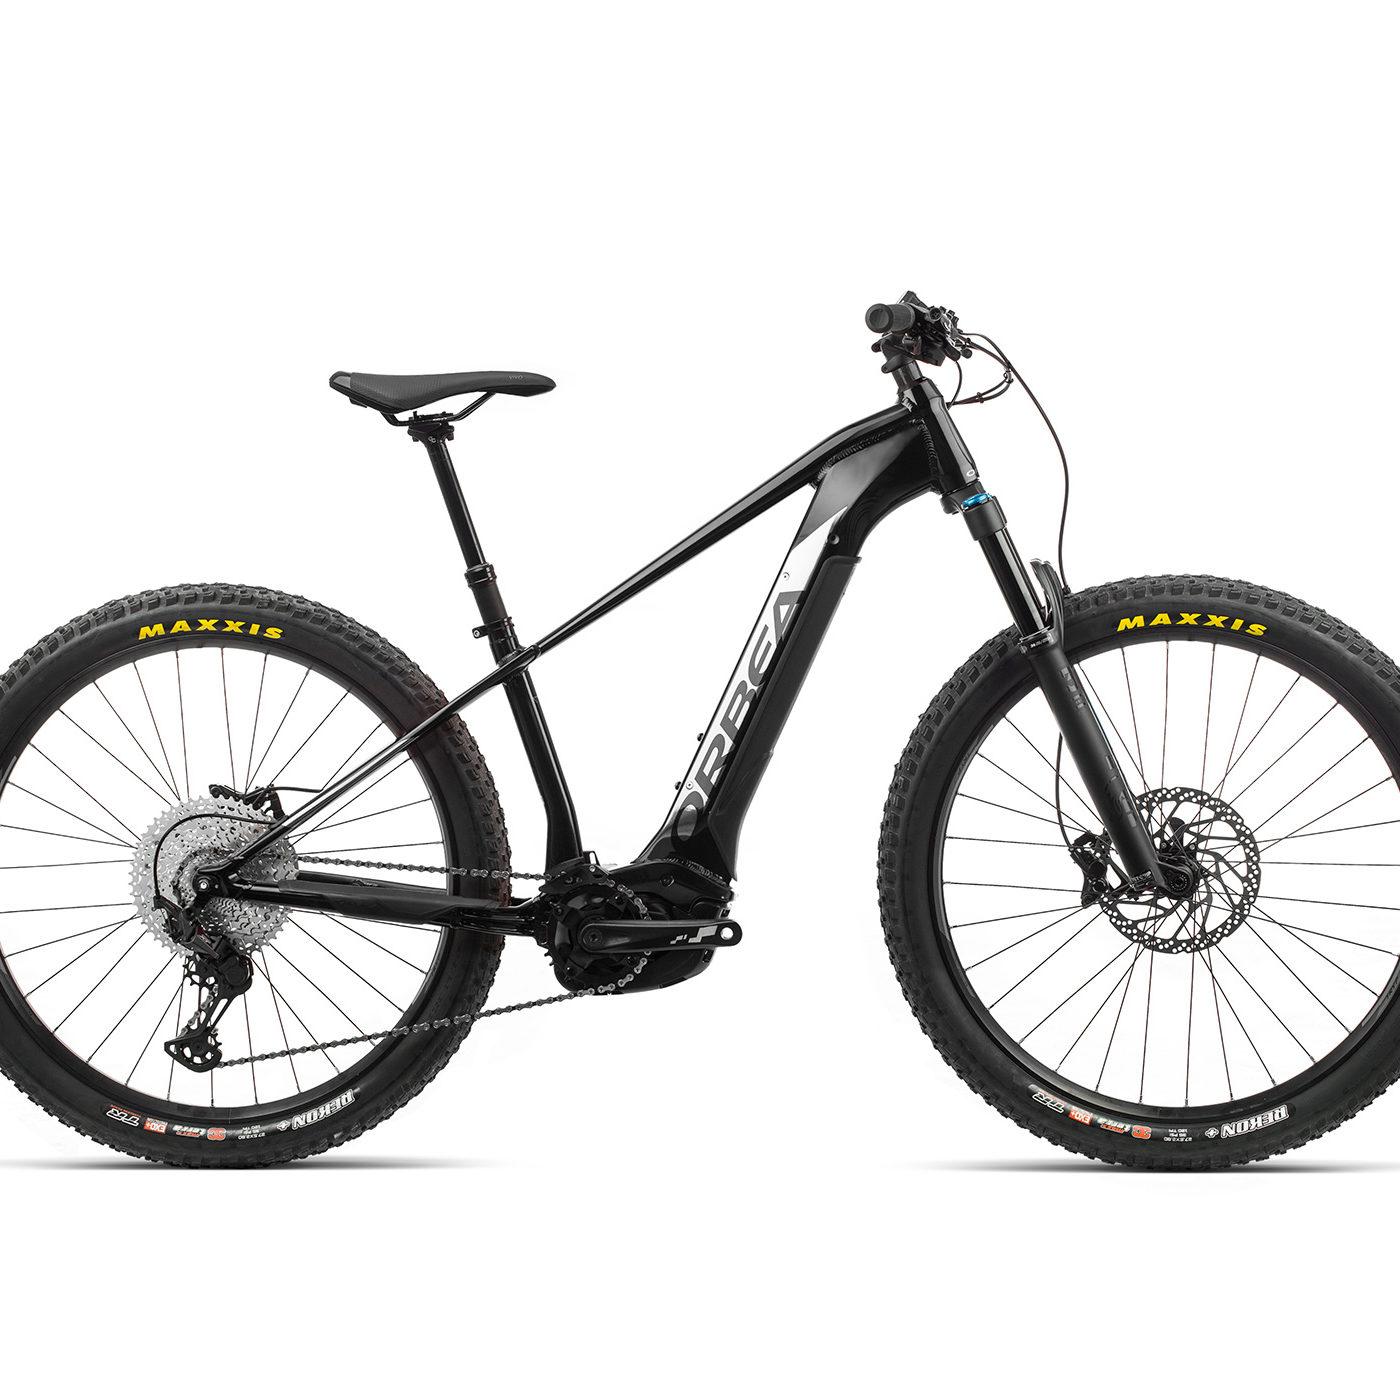 ORBEA WILD HT20 27 ebike - METALLIC ZWART / TITANIUM(GLOSS) @G-Bikes